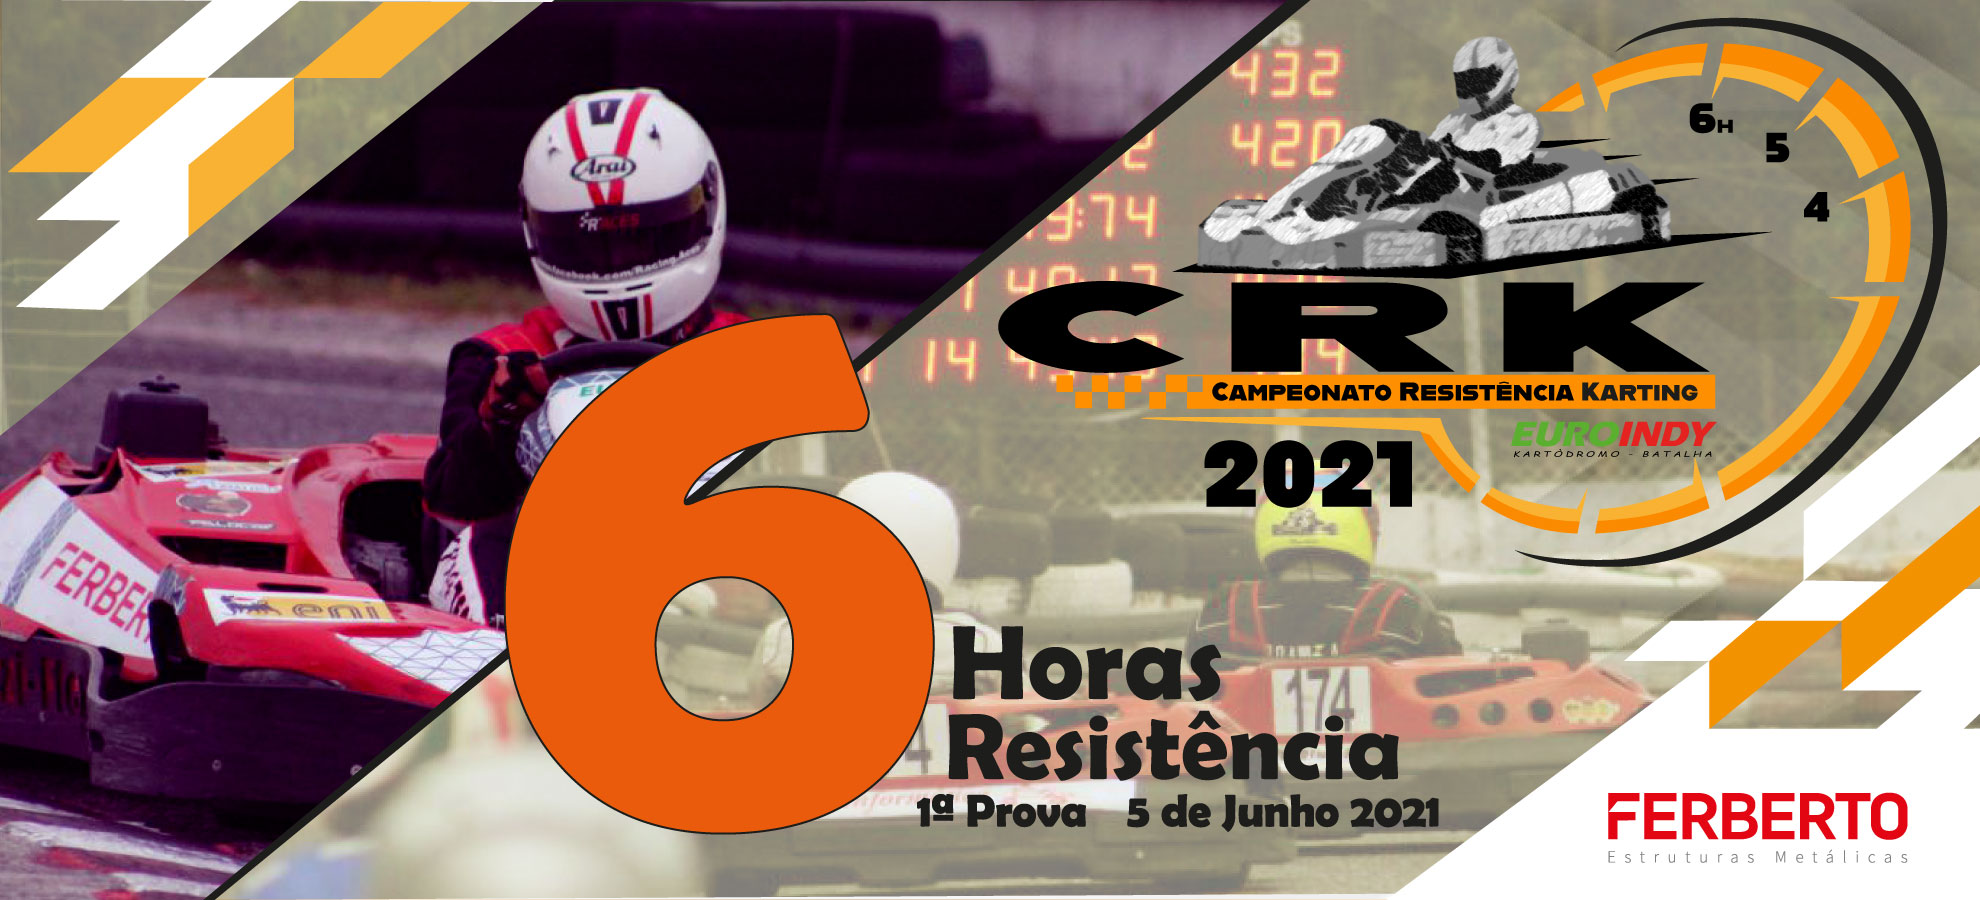 Campeonato Resistencia Kart